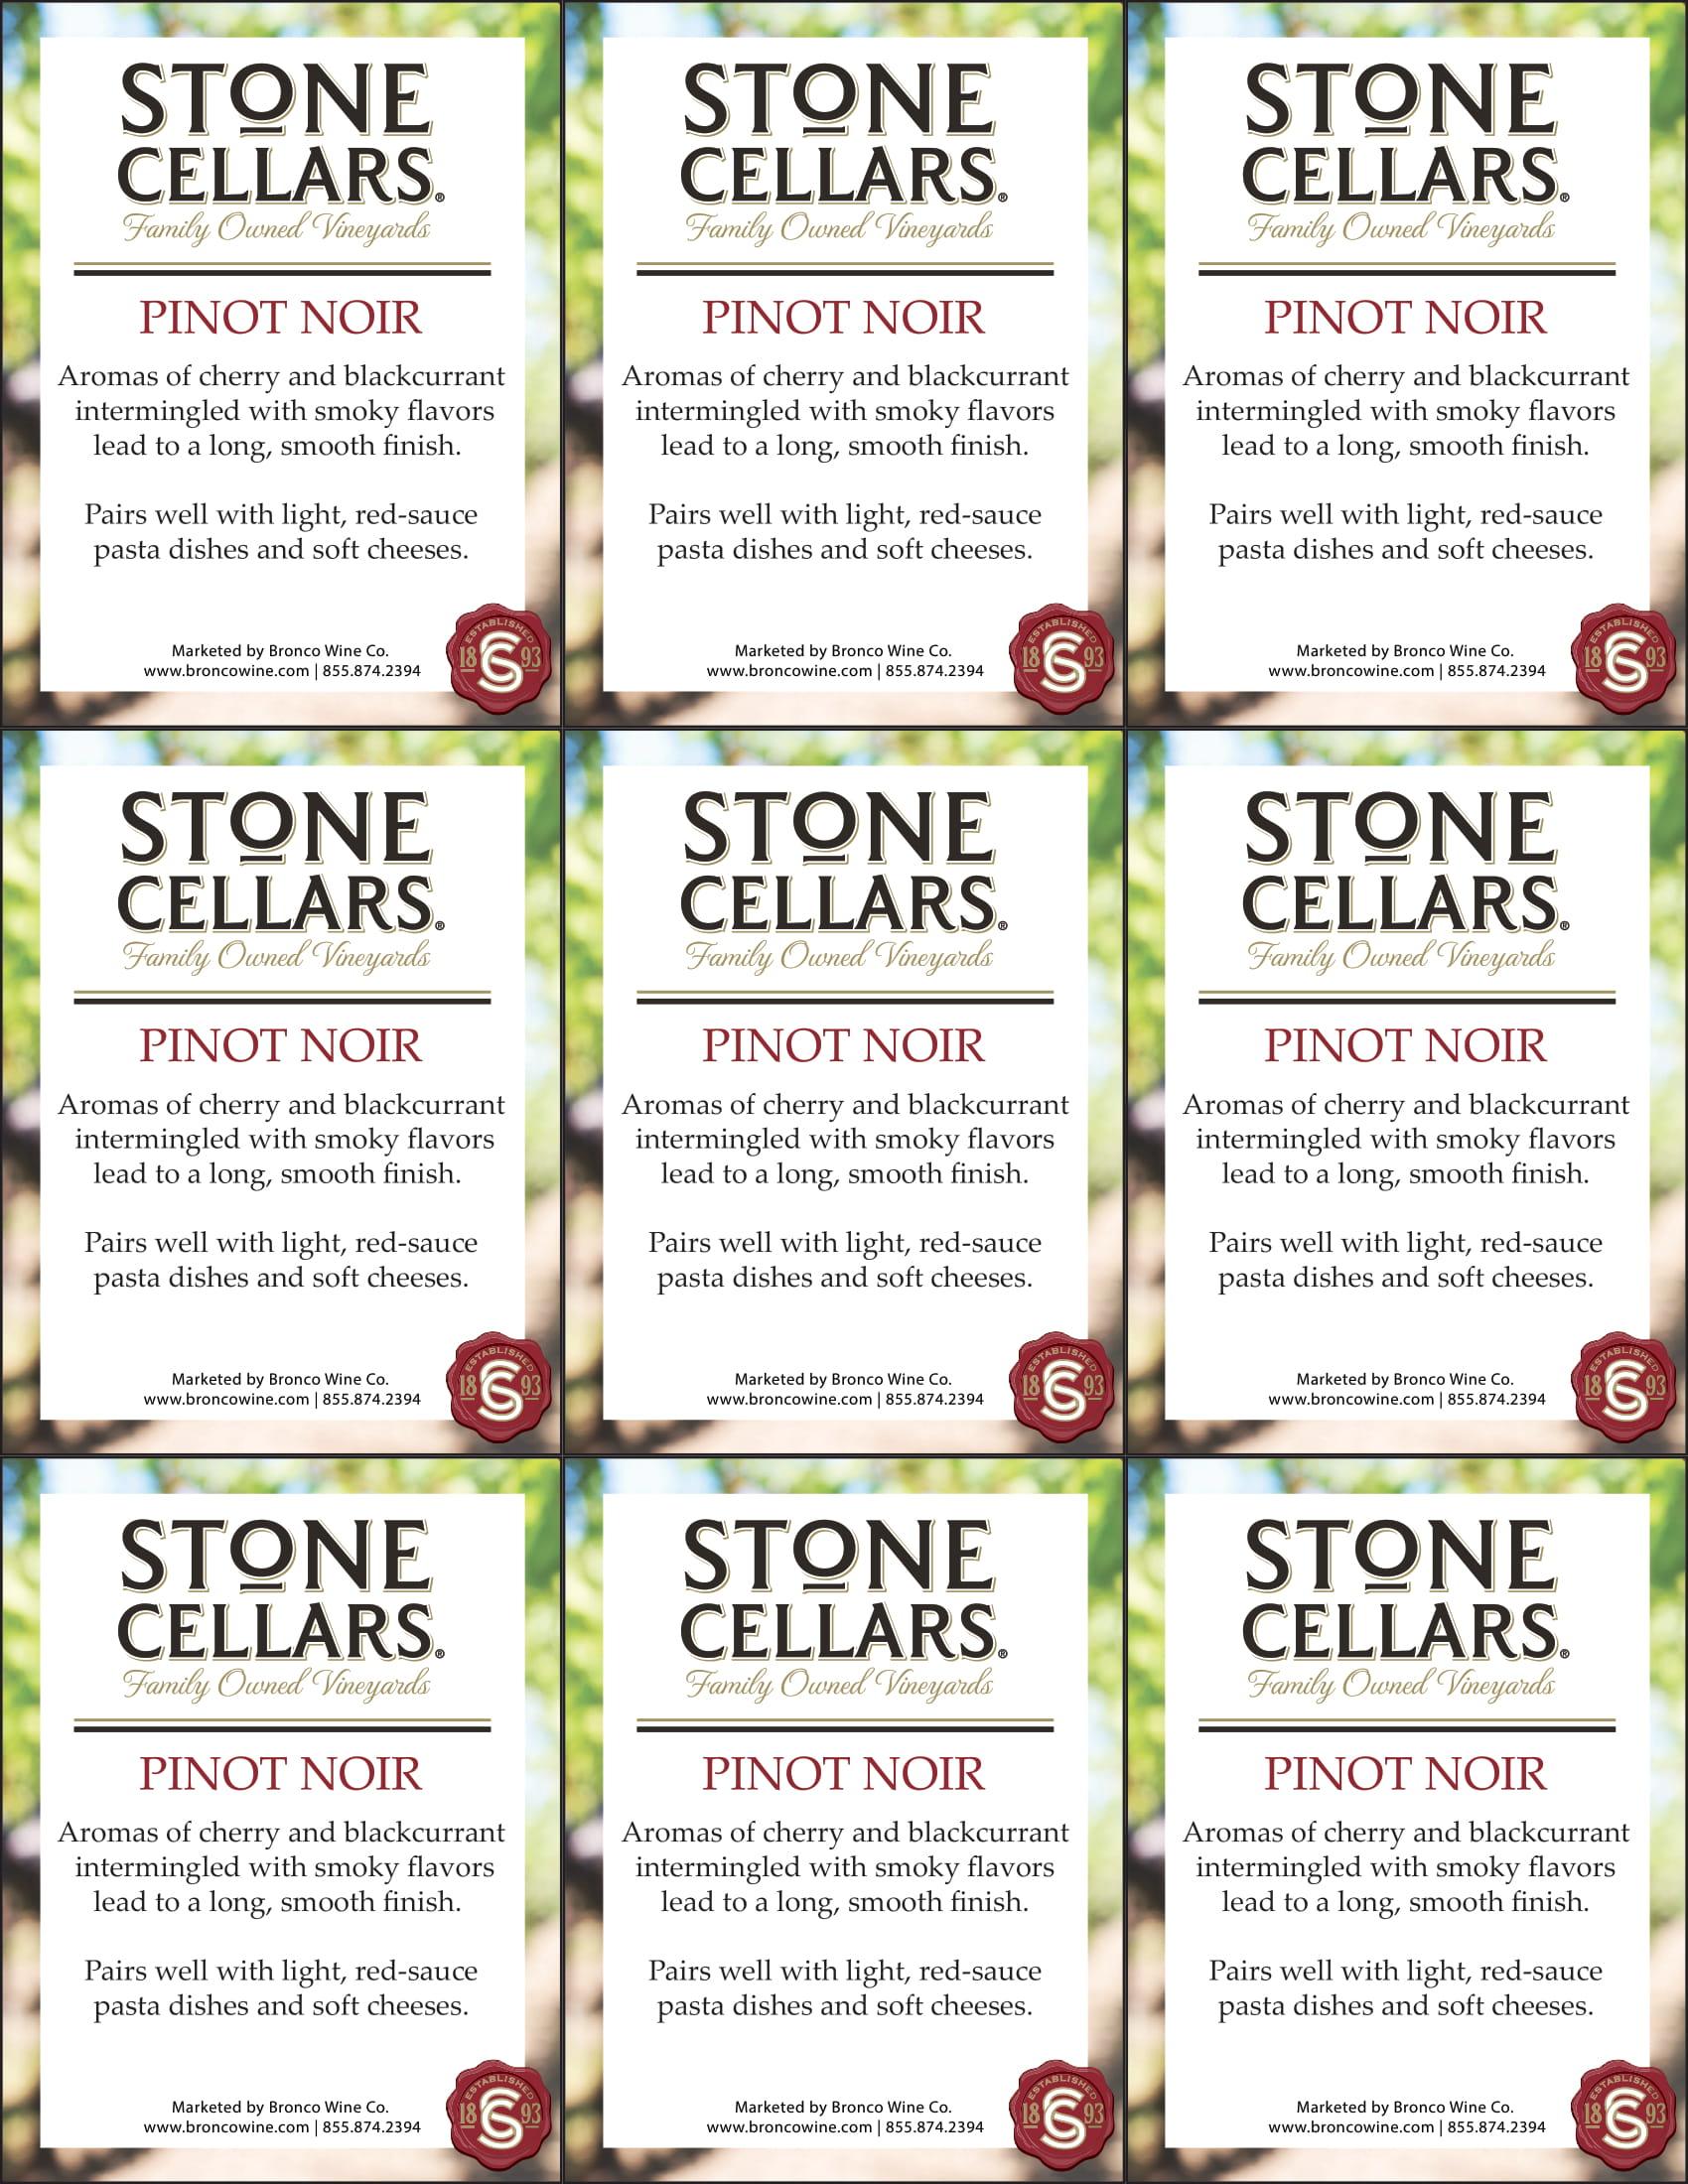 Stone Cellars Pinot Noir Shelf Talker